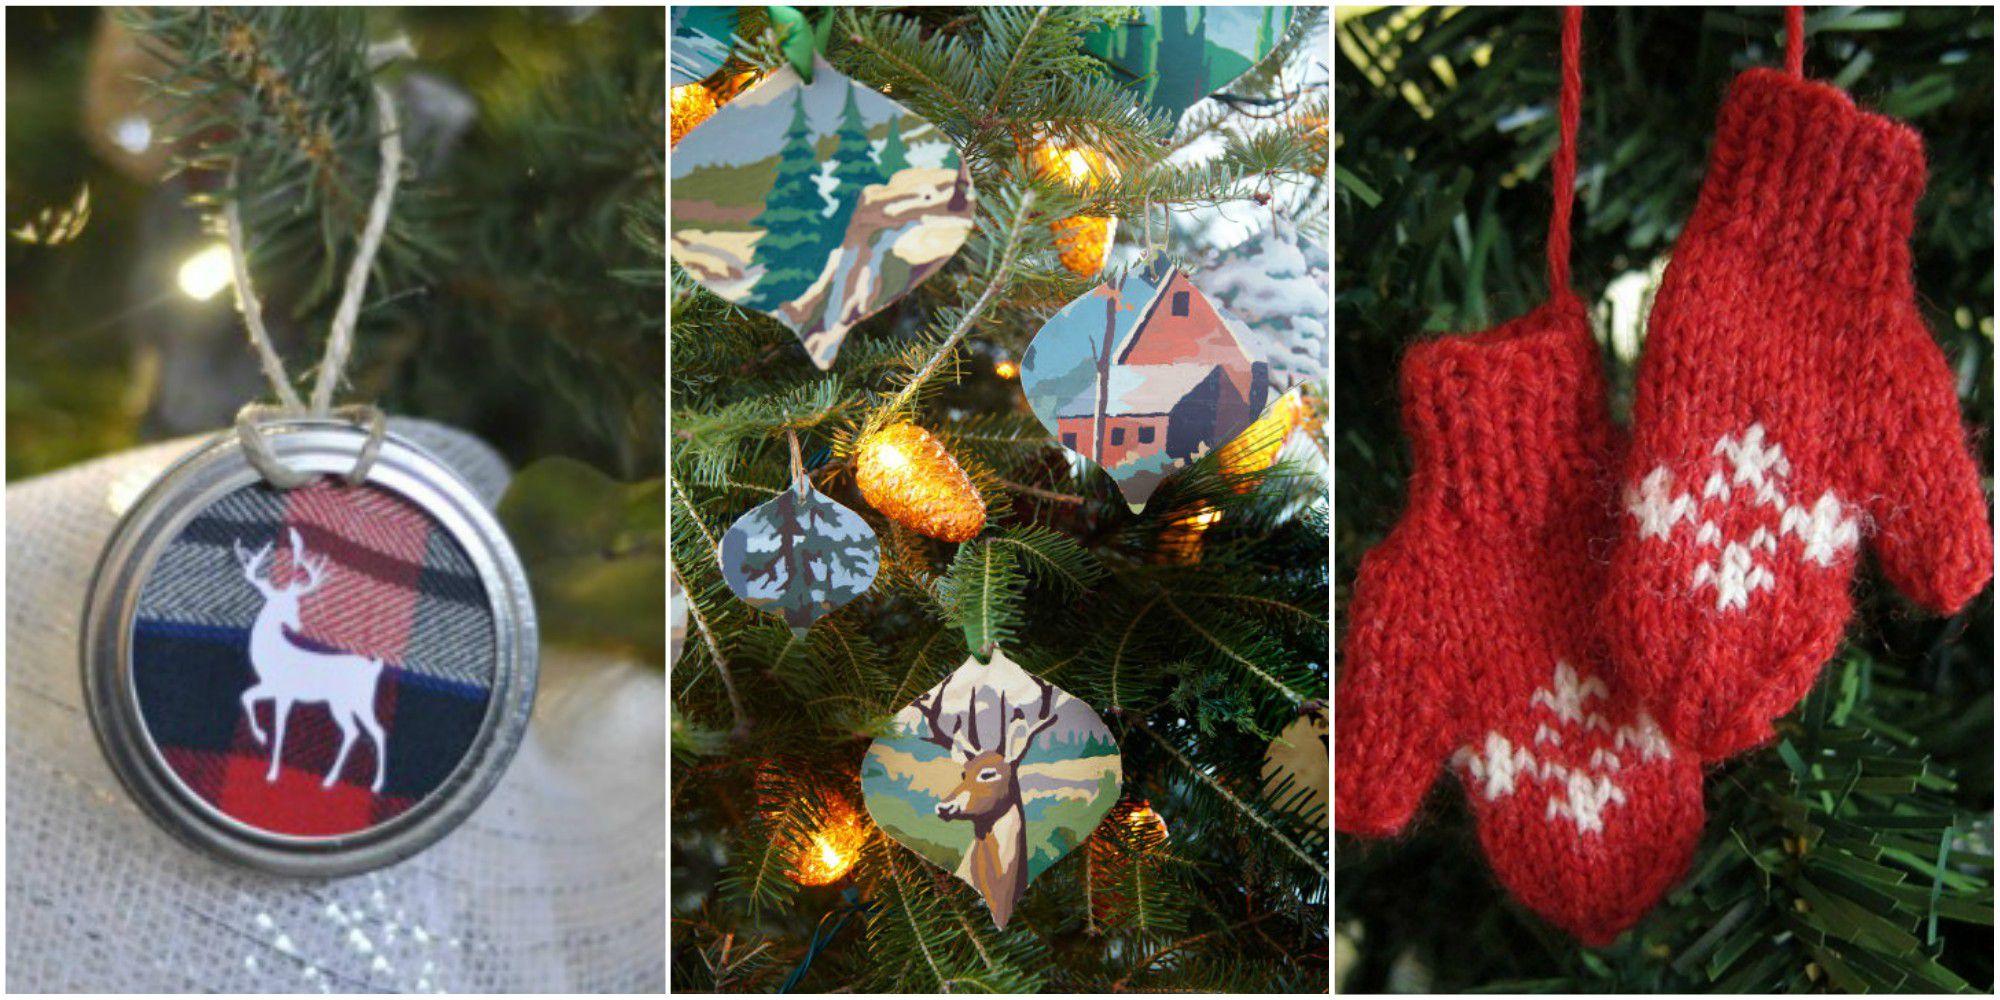 55 Homemade Christmas Ornaments - DIY Crafts with Christmas Tree ...